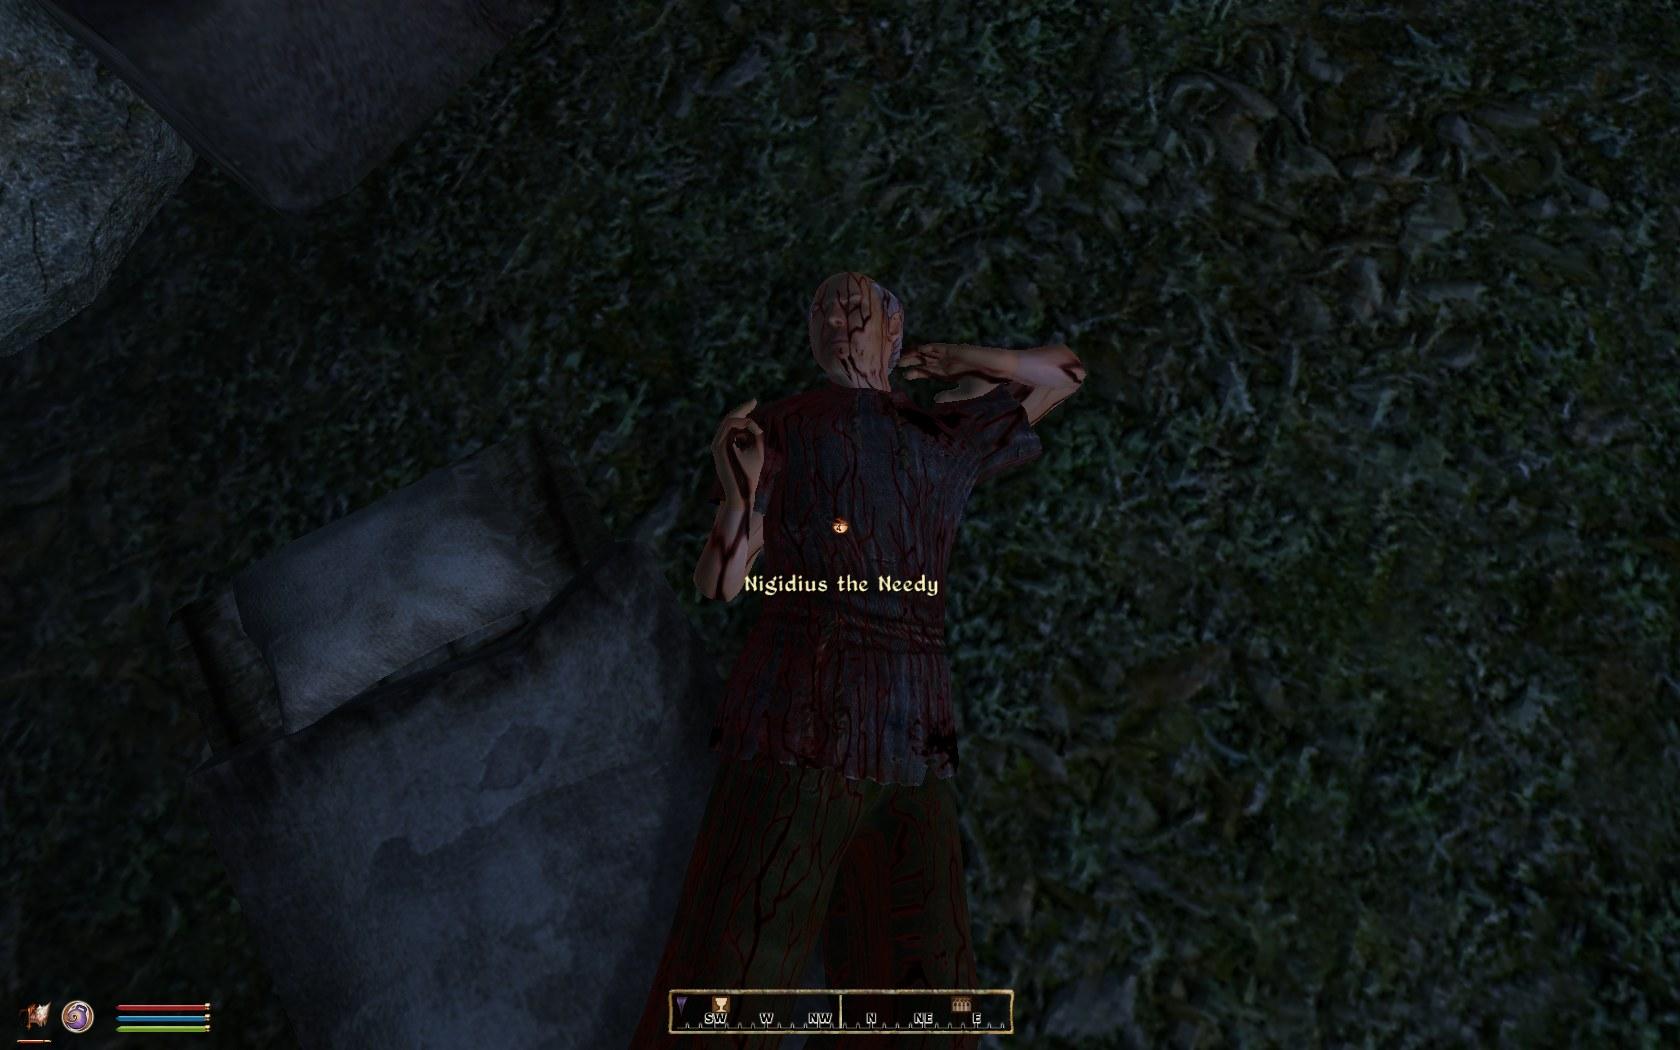 Unholy Darkness - Complete Vampire Overhaul for Oblivion